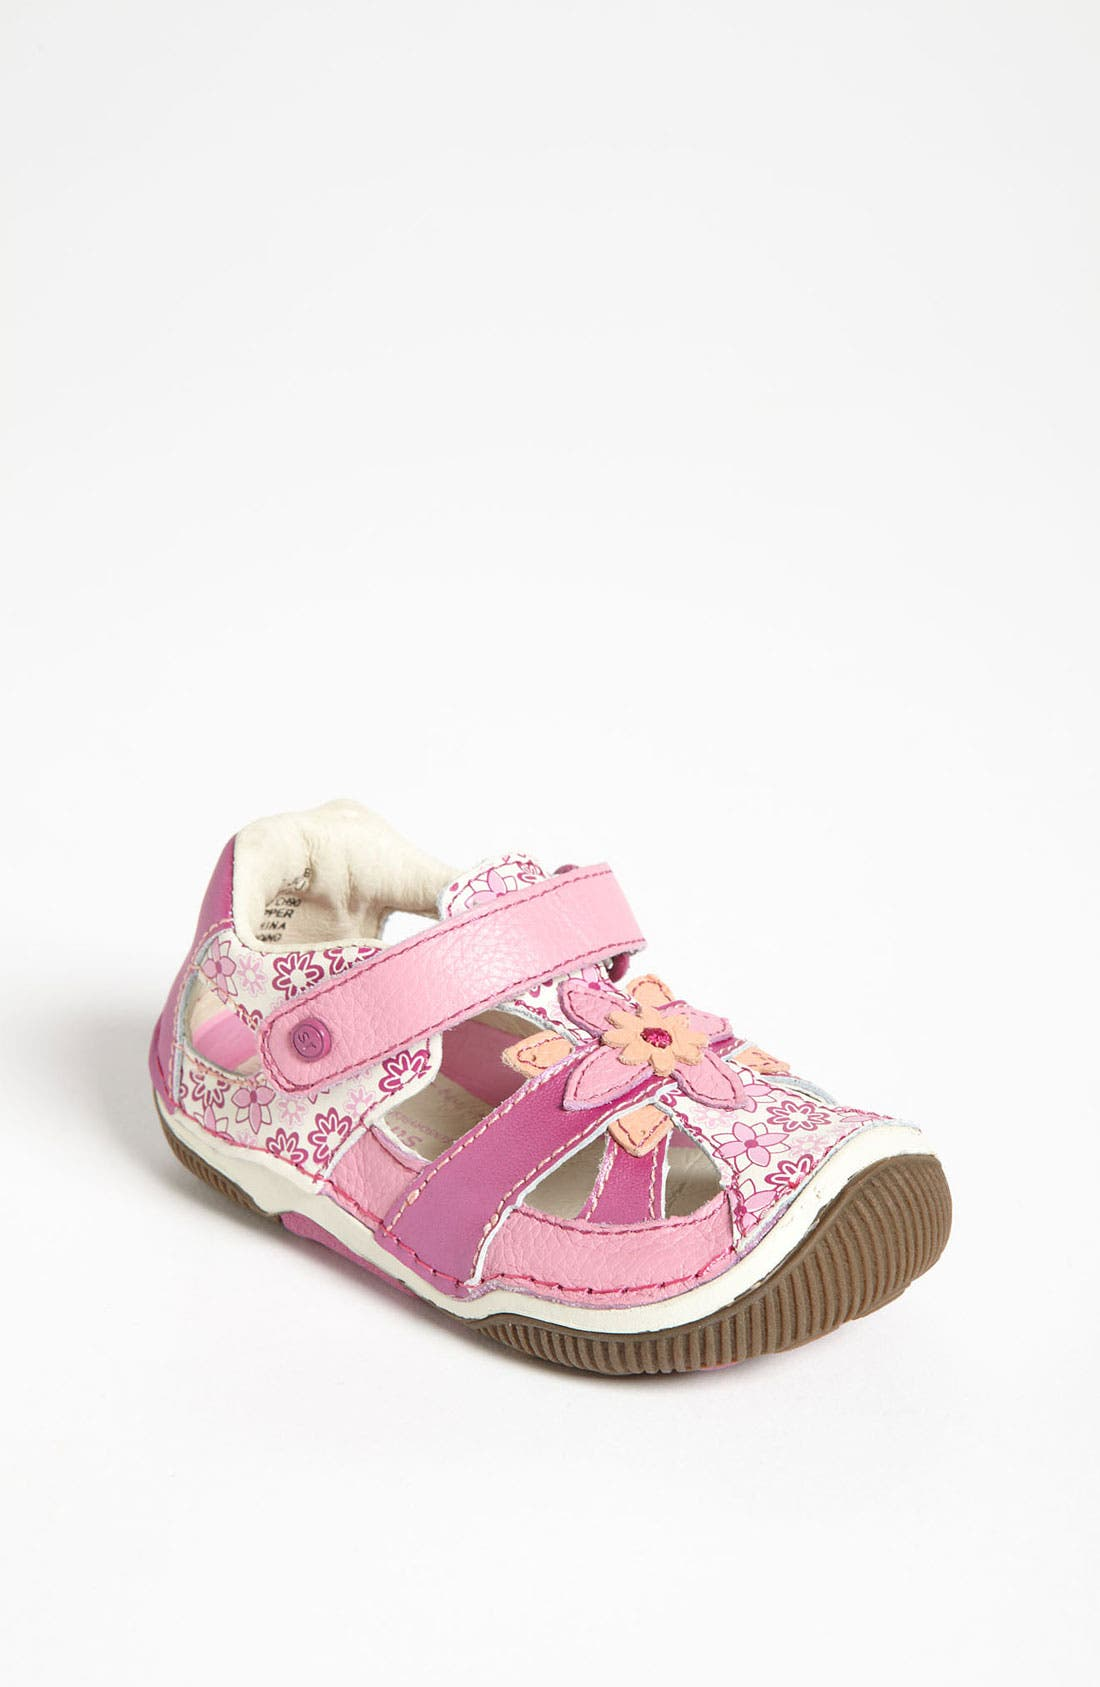 Alternate Image 1 Selected - Stride Rite 'Junie' Sandal (Baby, Walker & Toddler)